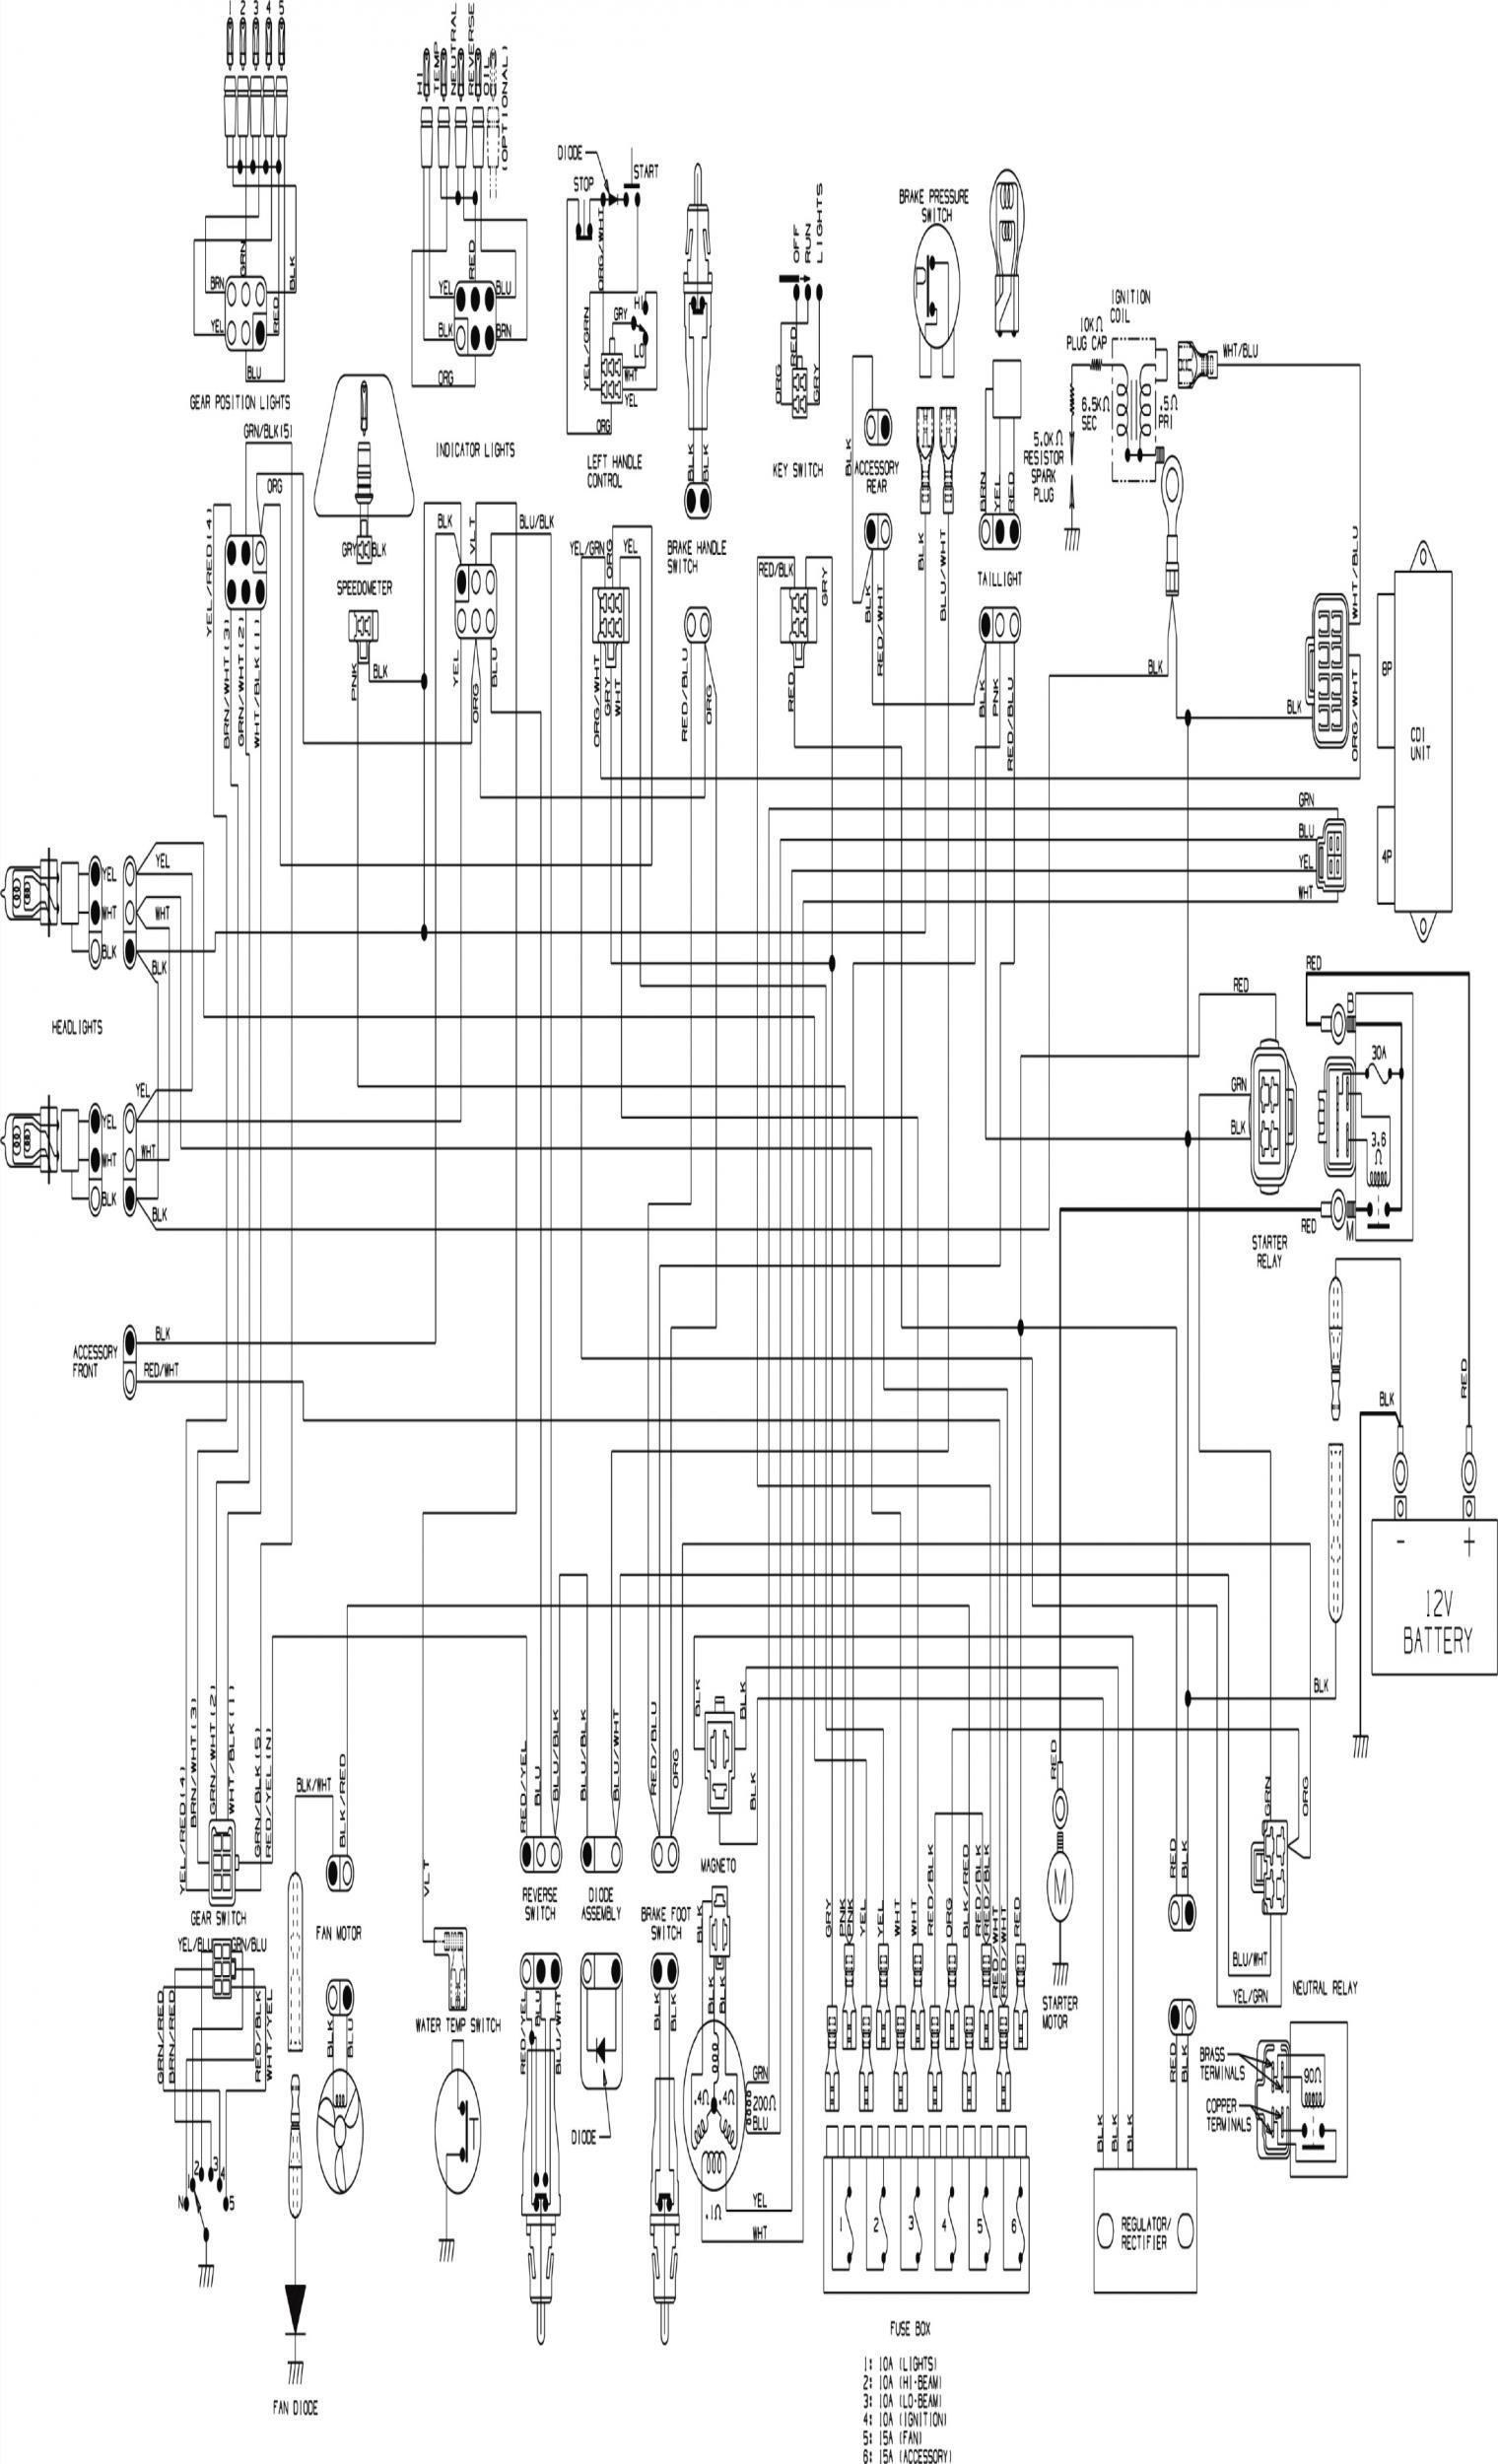 2006 can am outlander 650 wiring diagram yamaha g1 gas golf cart 400 free for you best secret u2022 rh anutechnologies co kodiak